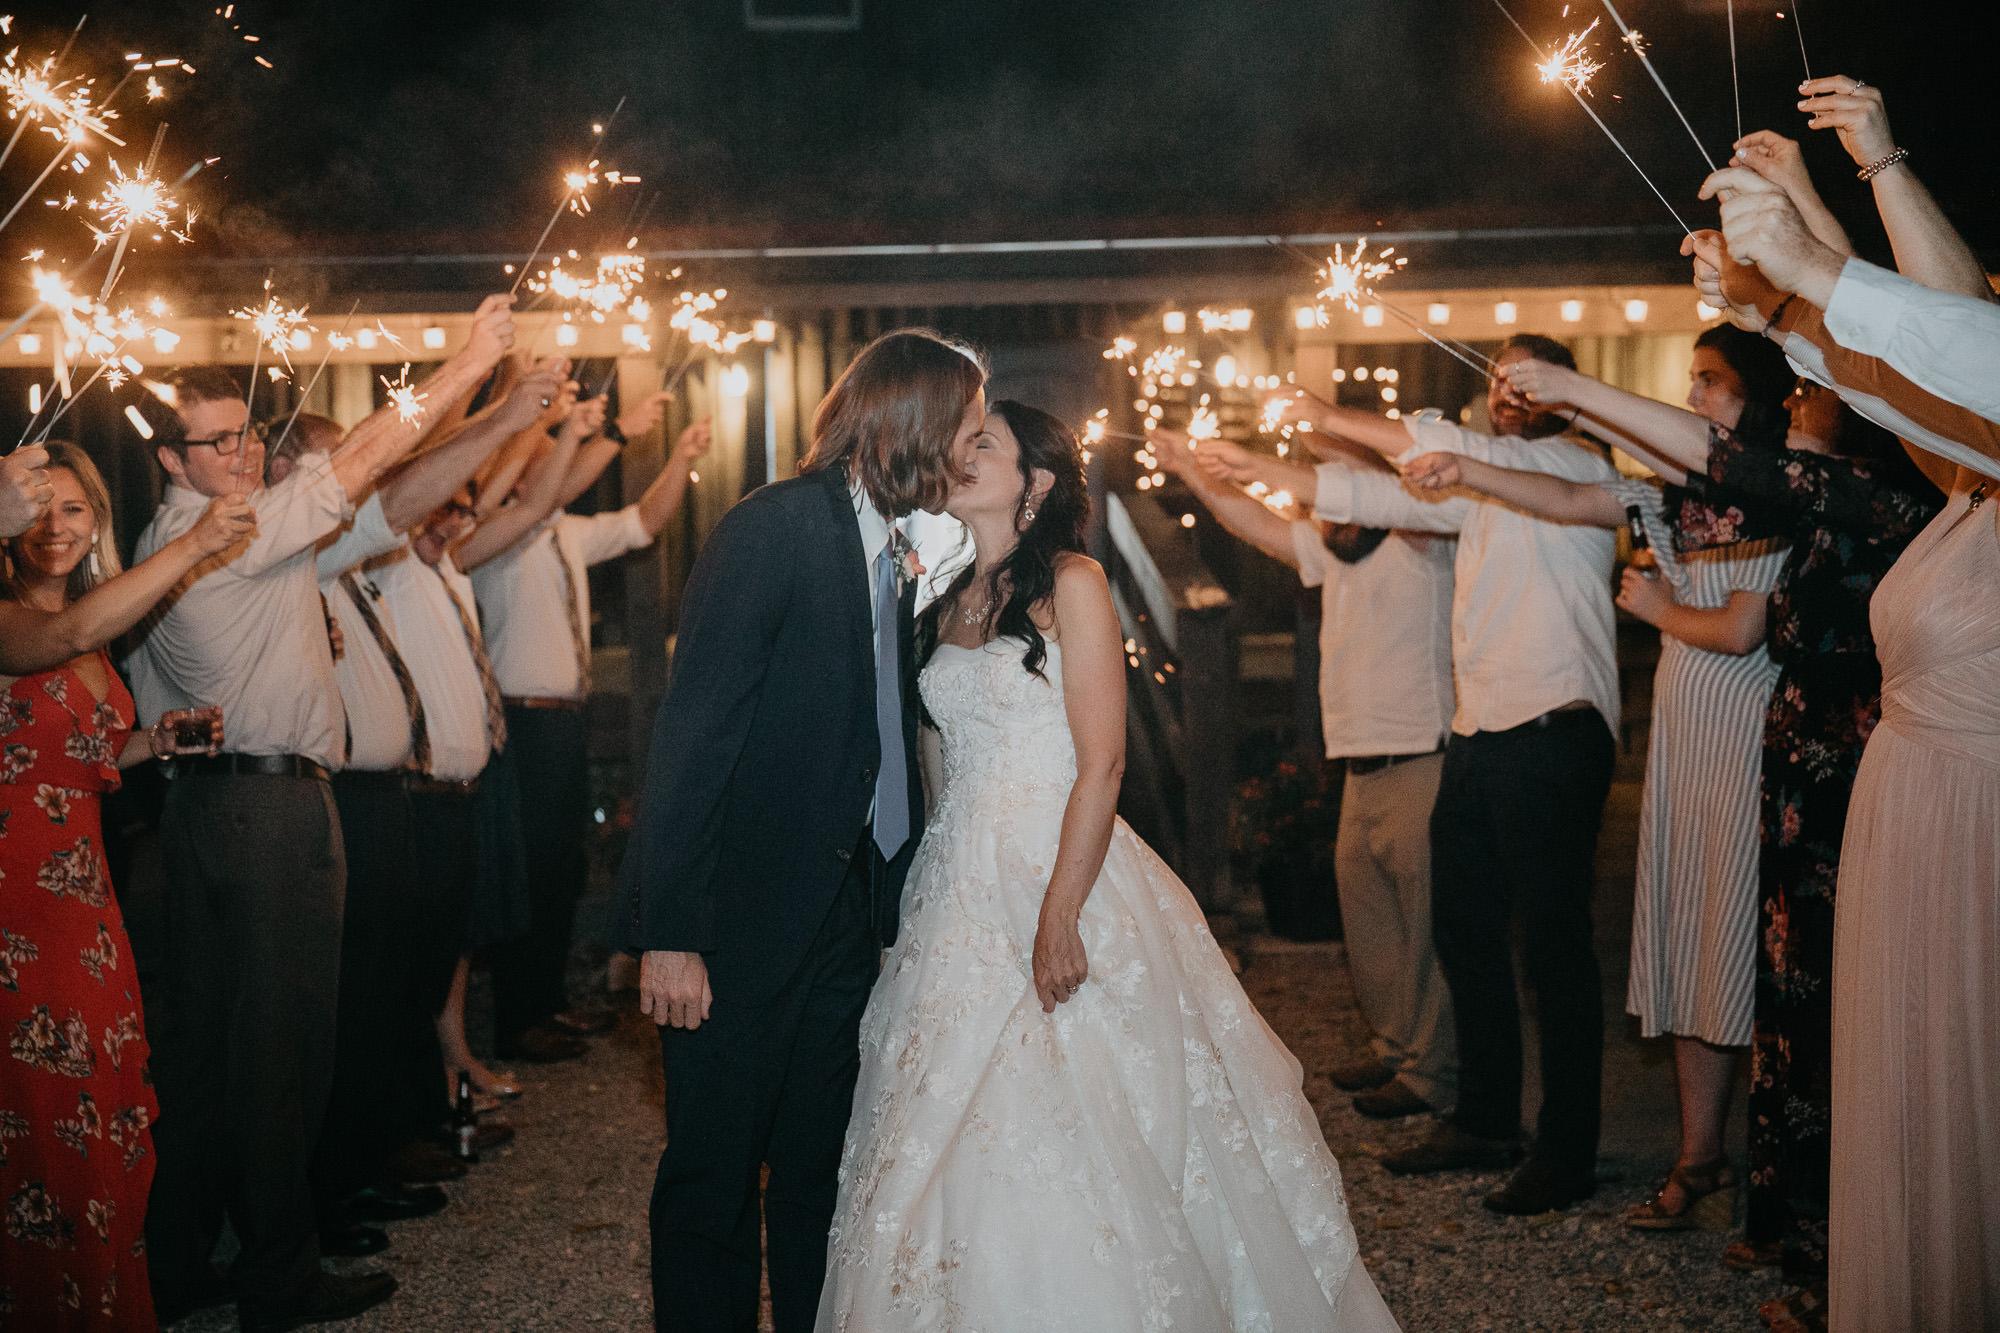 Doe Creek Farm - Weddings - Virginia - Best Wedding Photographer - Pat Cori Photography-81.jpg